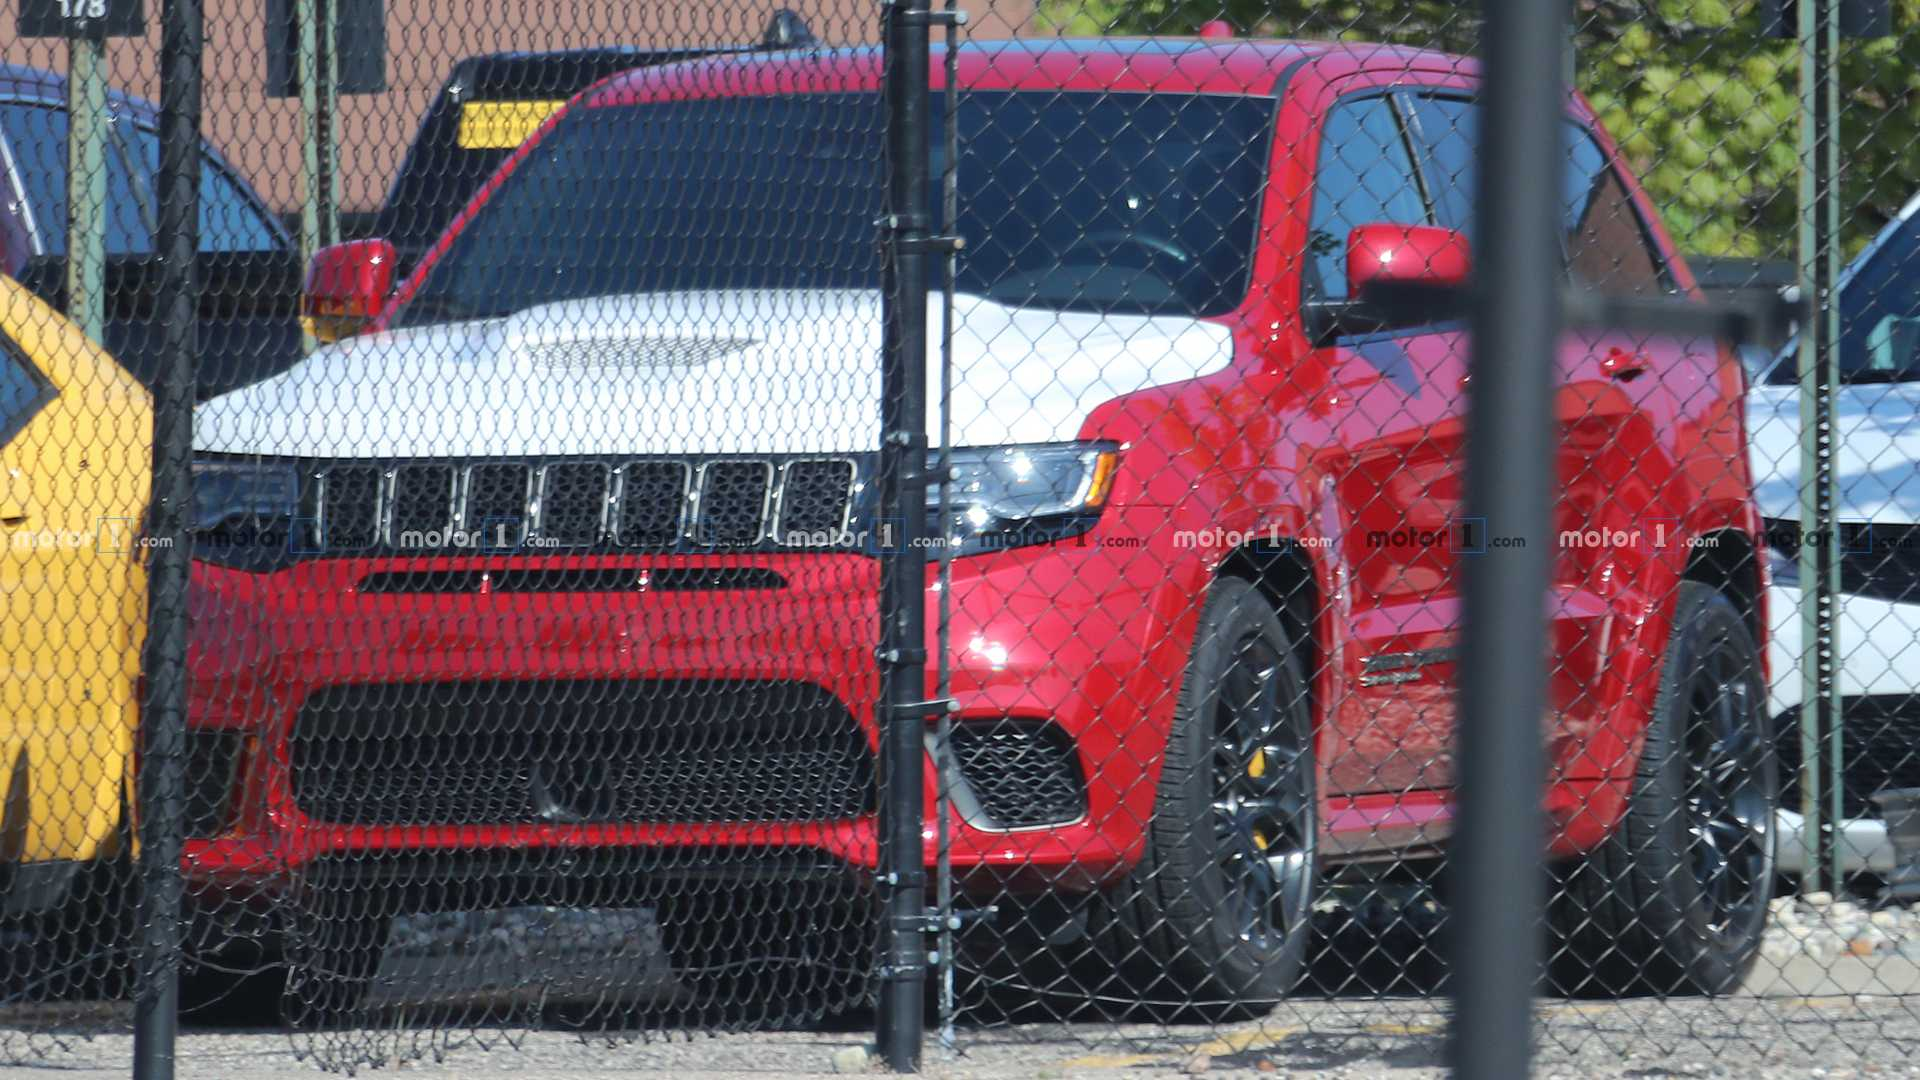 Jeep Grand Cherokee Trackhawk Spy Shots Suggest Last Hurrah Is Coming